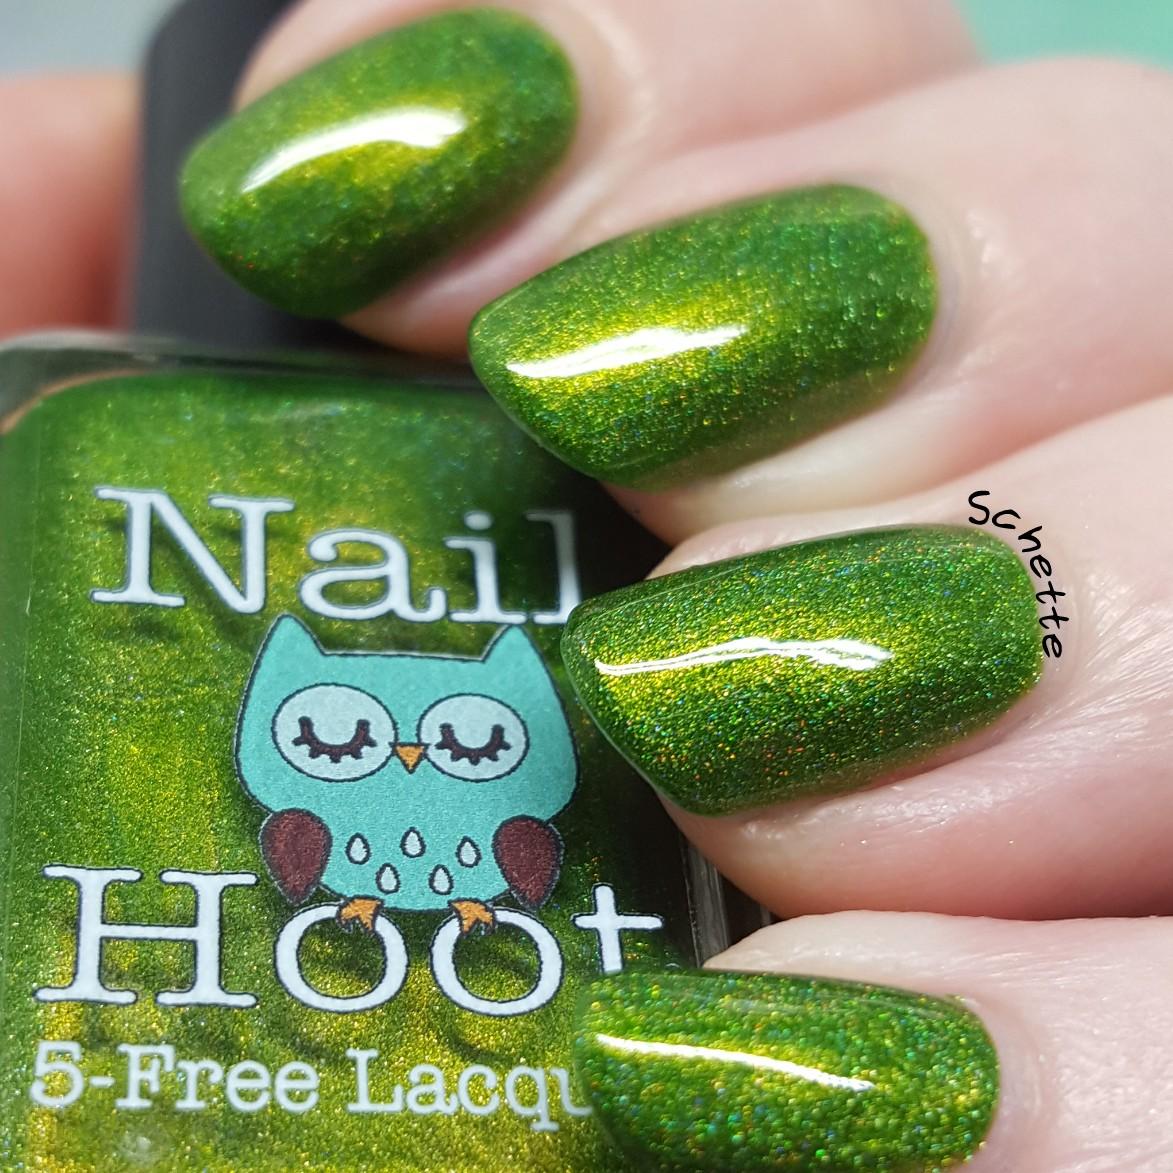 Nail Hoot - Peridot August